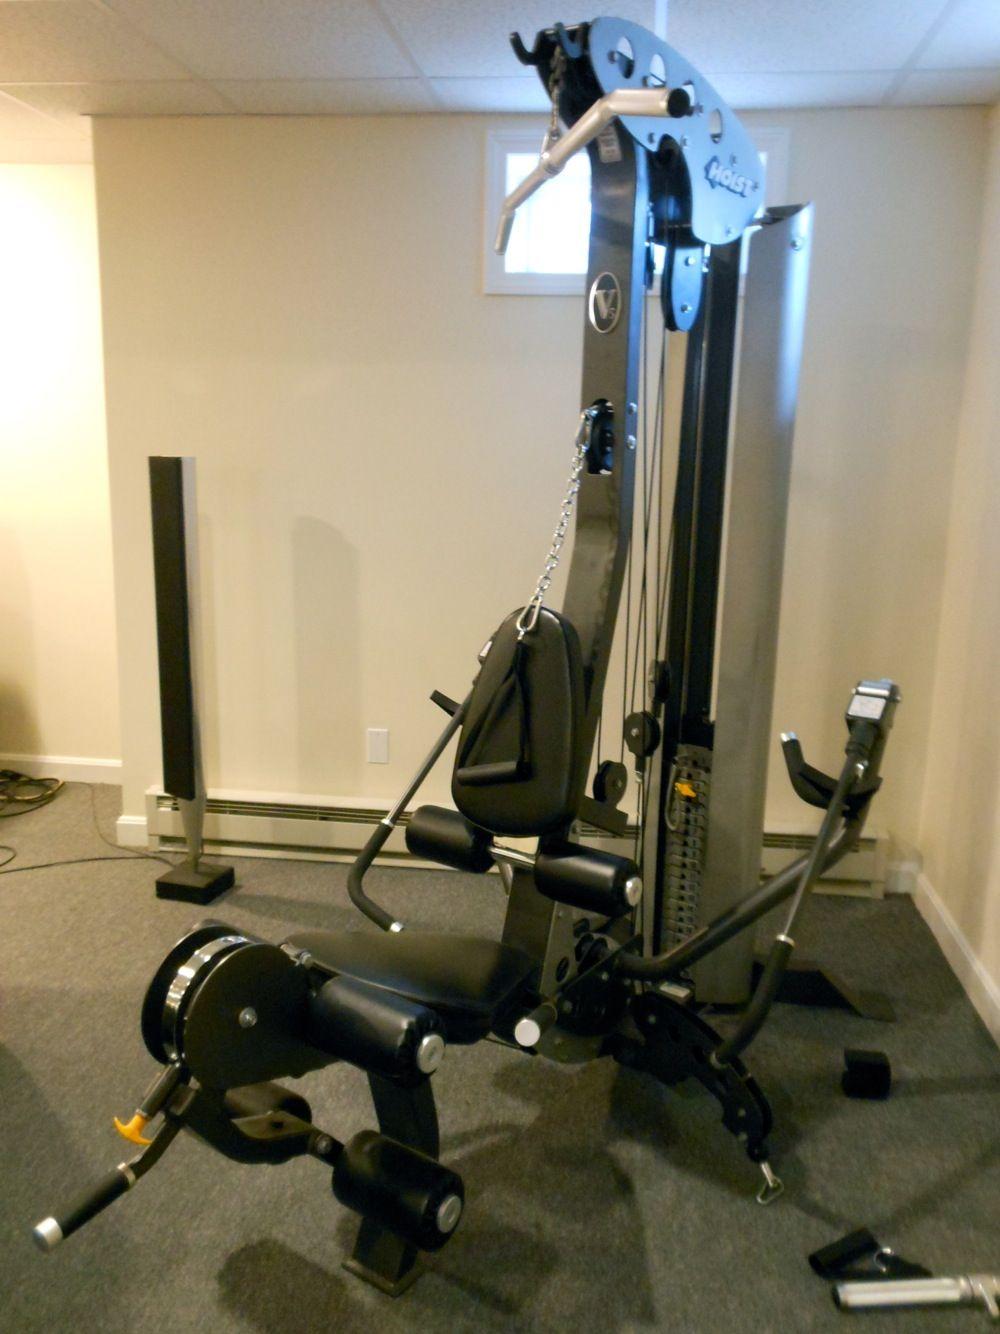 Hoist v5 universal gym gym equipment at home gym gym workouts gym